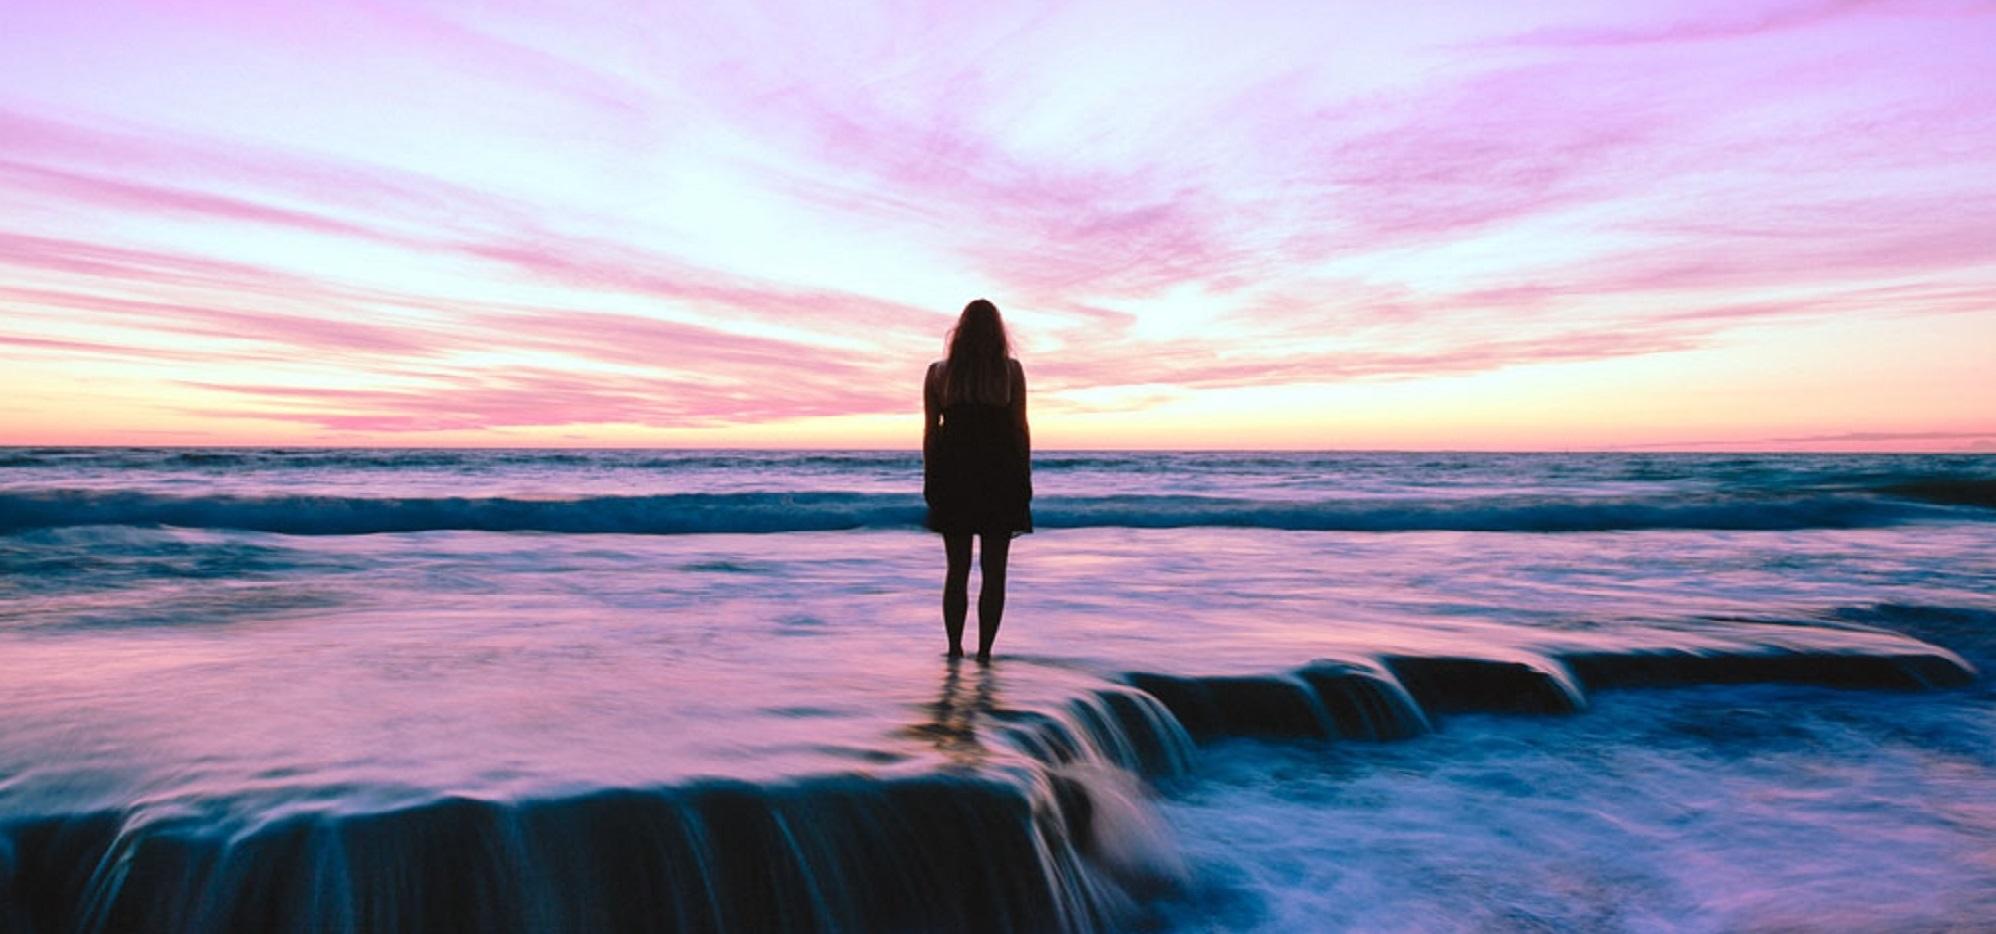 beach-927935 edited